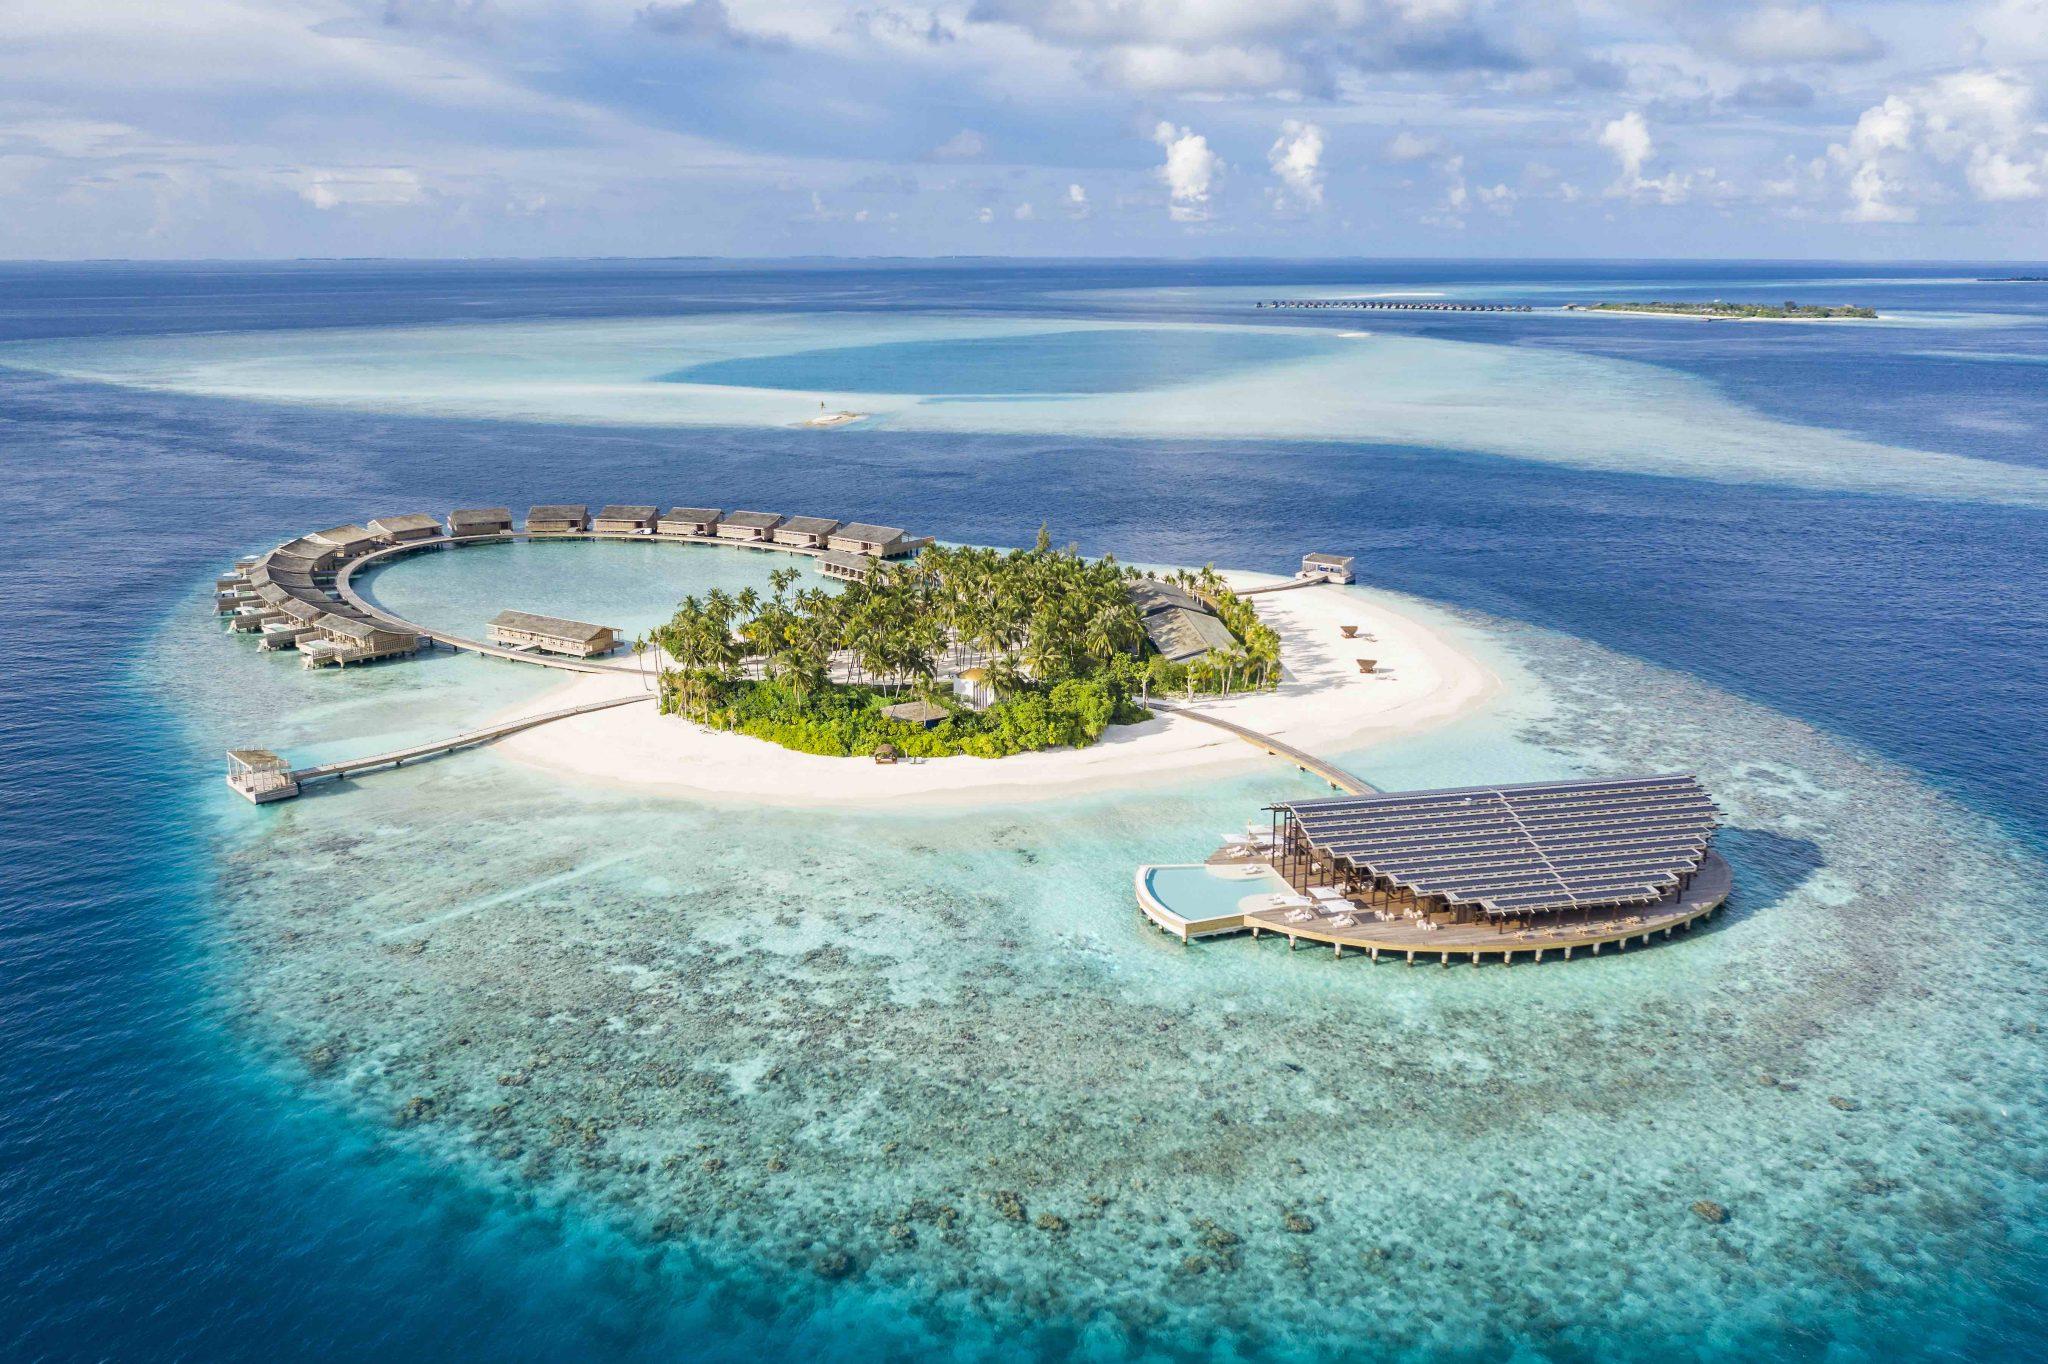 Aerial view of Kudadoo Maldives Private Island ©DiegoDePol_01260